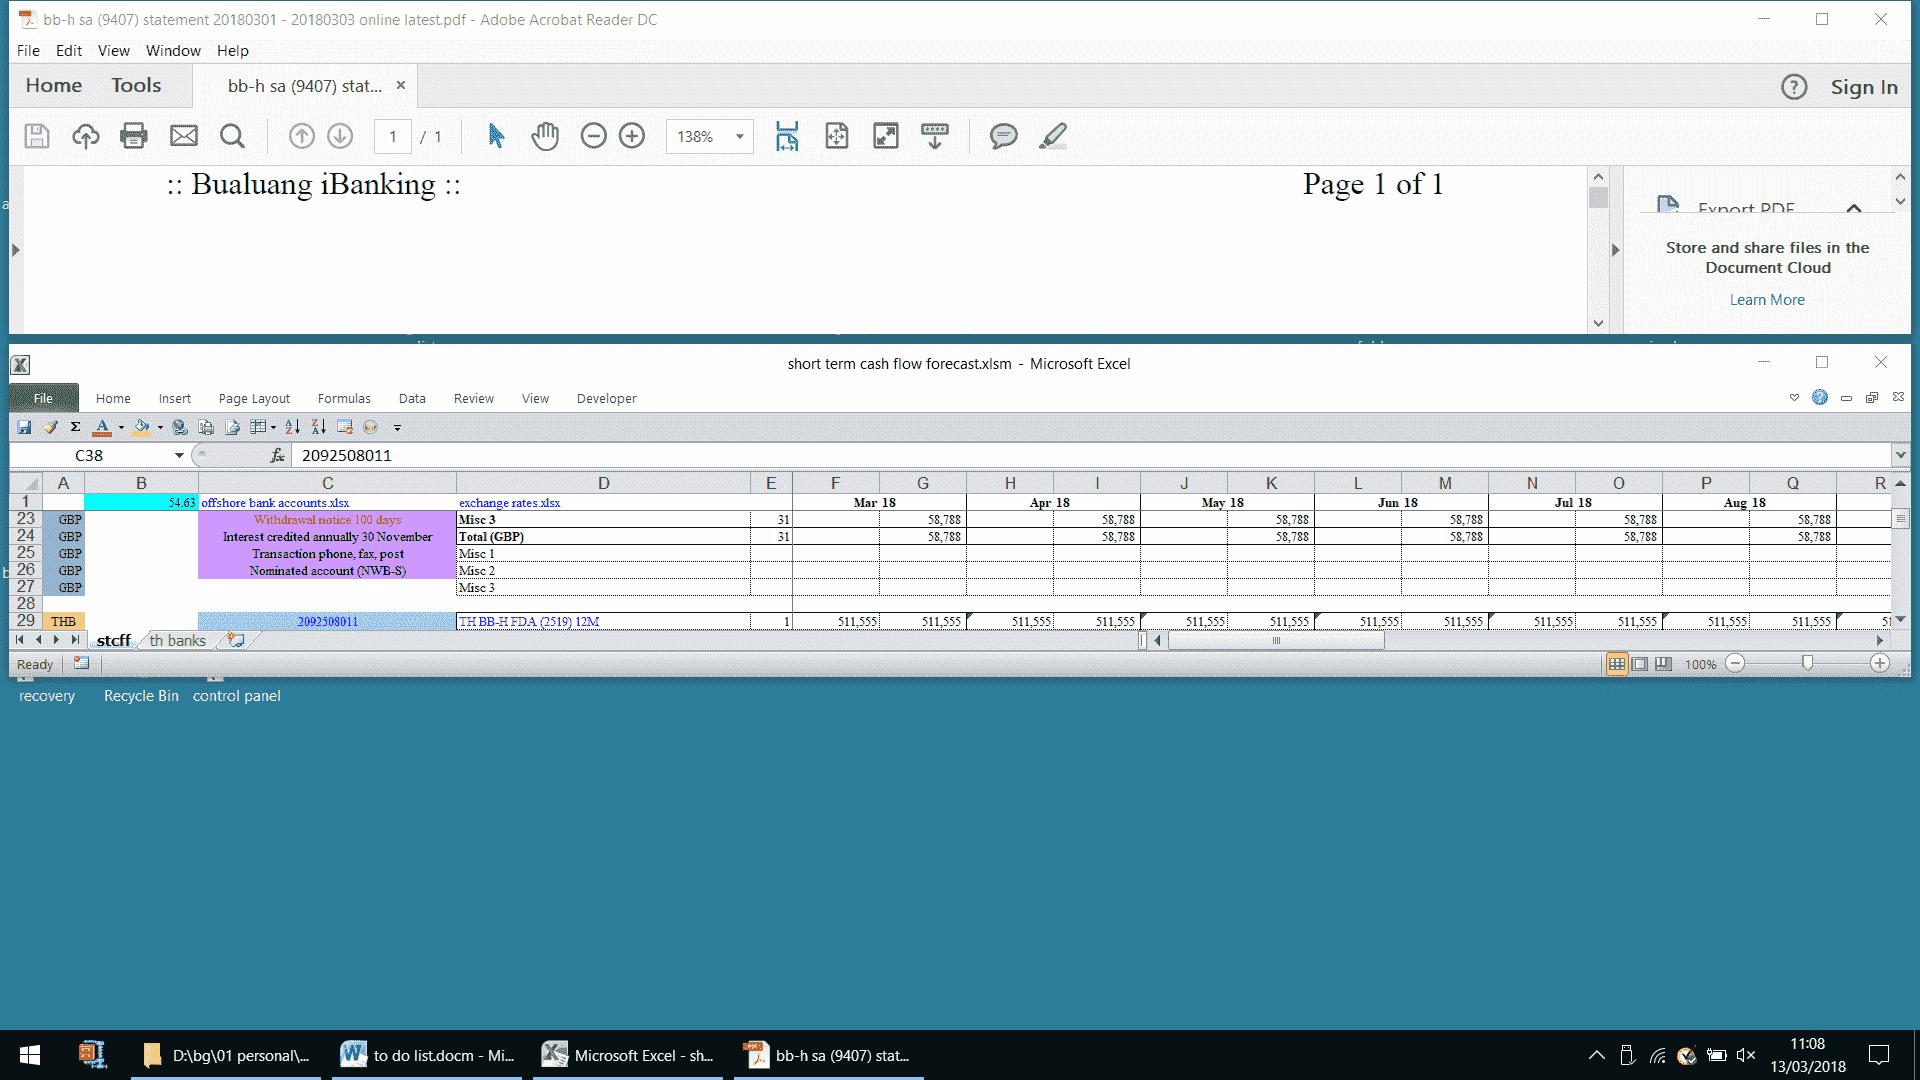 Win 10 File Explorer problem d274678c-ff32-493d-90ff-6668215b9b43?upload=true.png